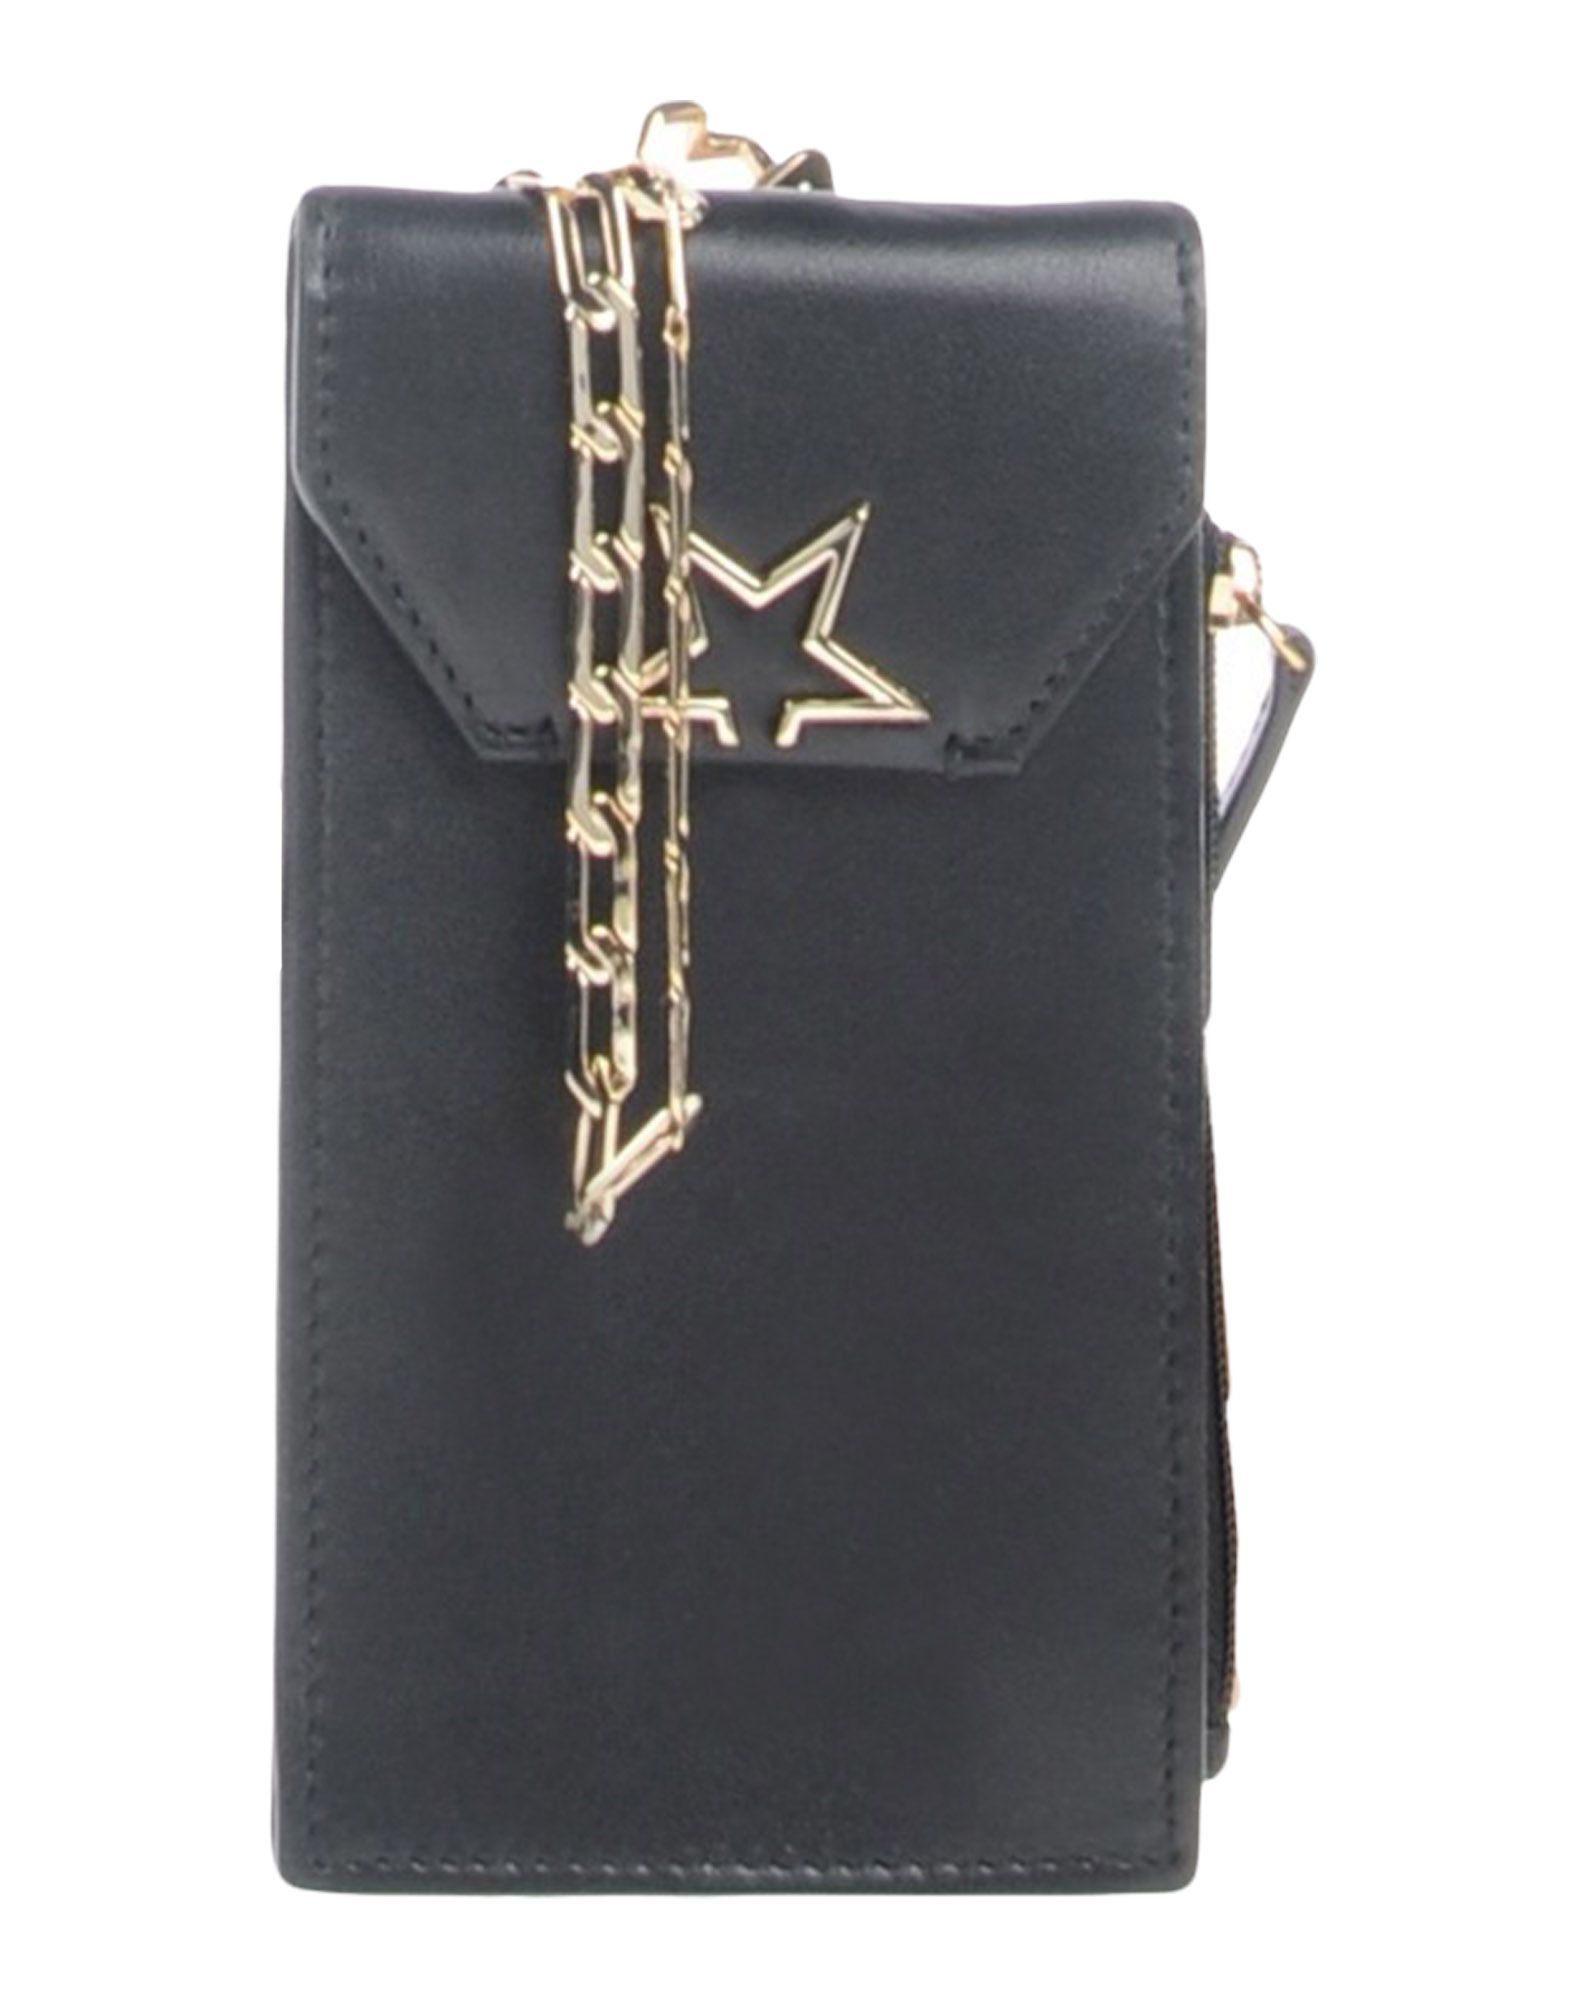 GOLDEN GOOSE DELUXE BRAND Сумка через плечо сумка через плечо famous brand 2015 pu zb 252